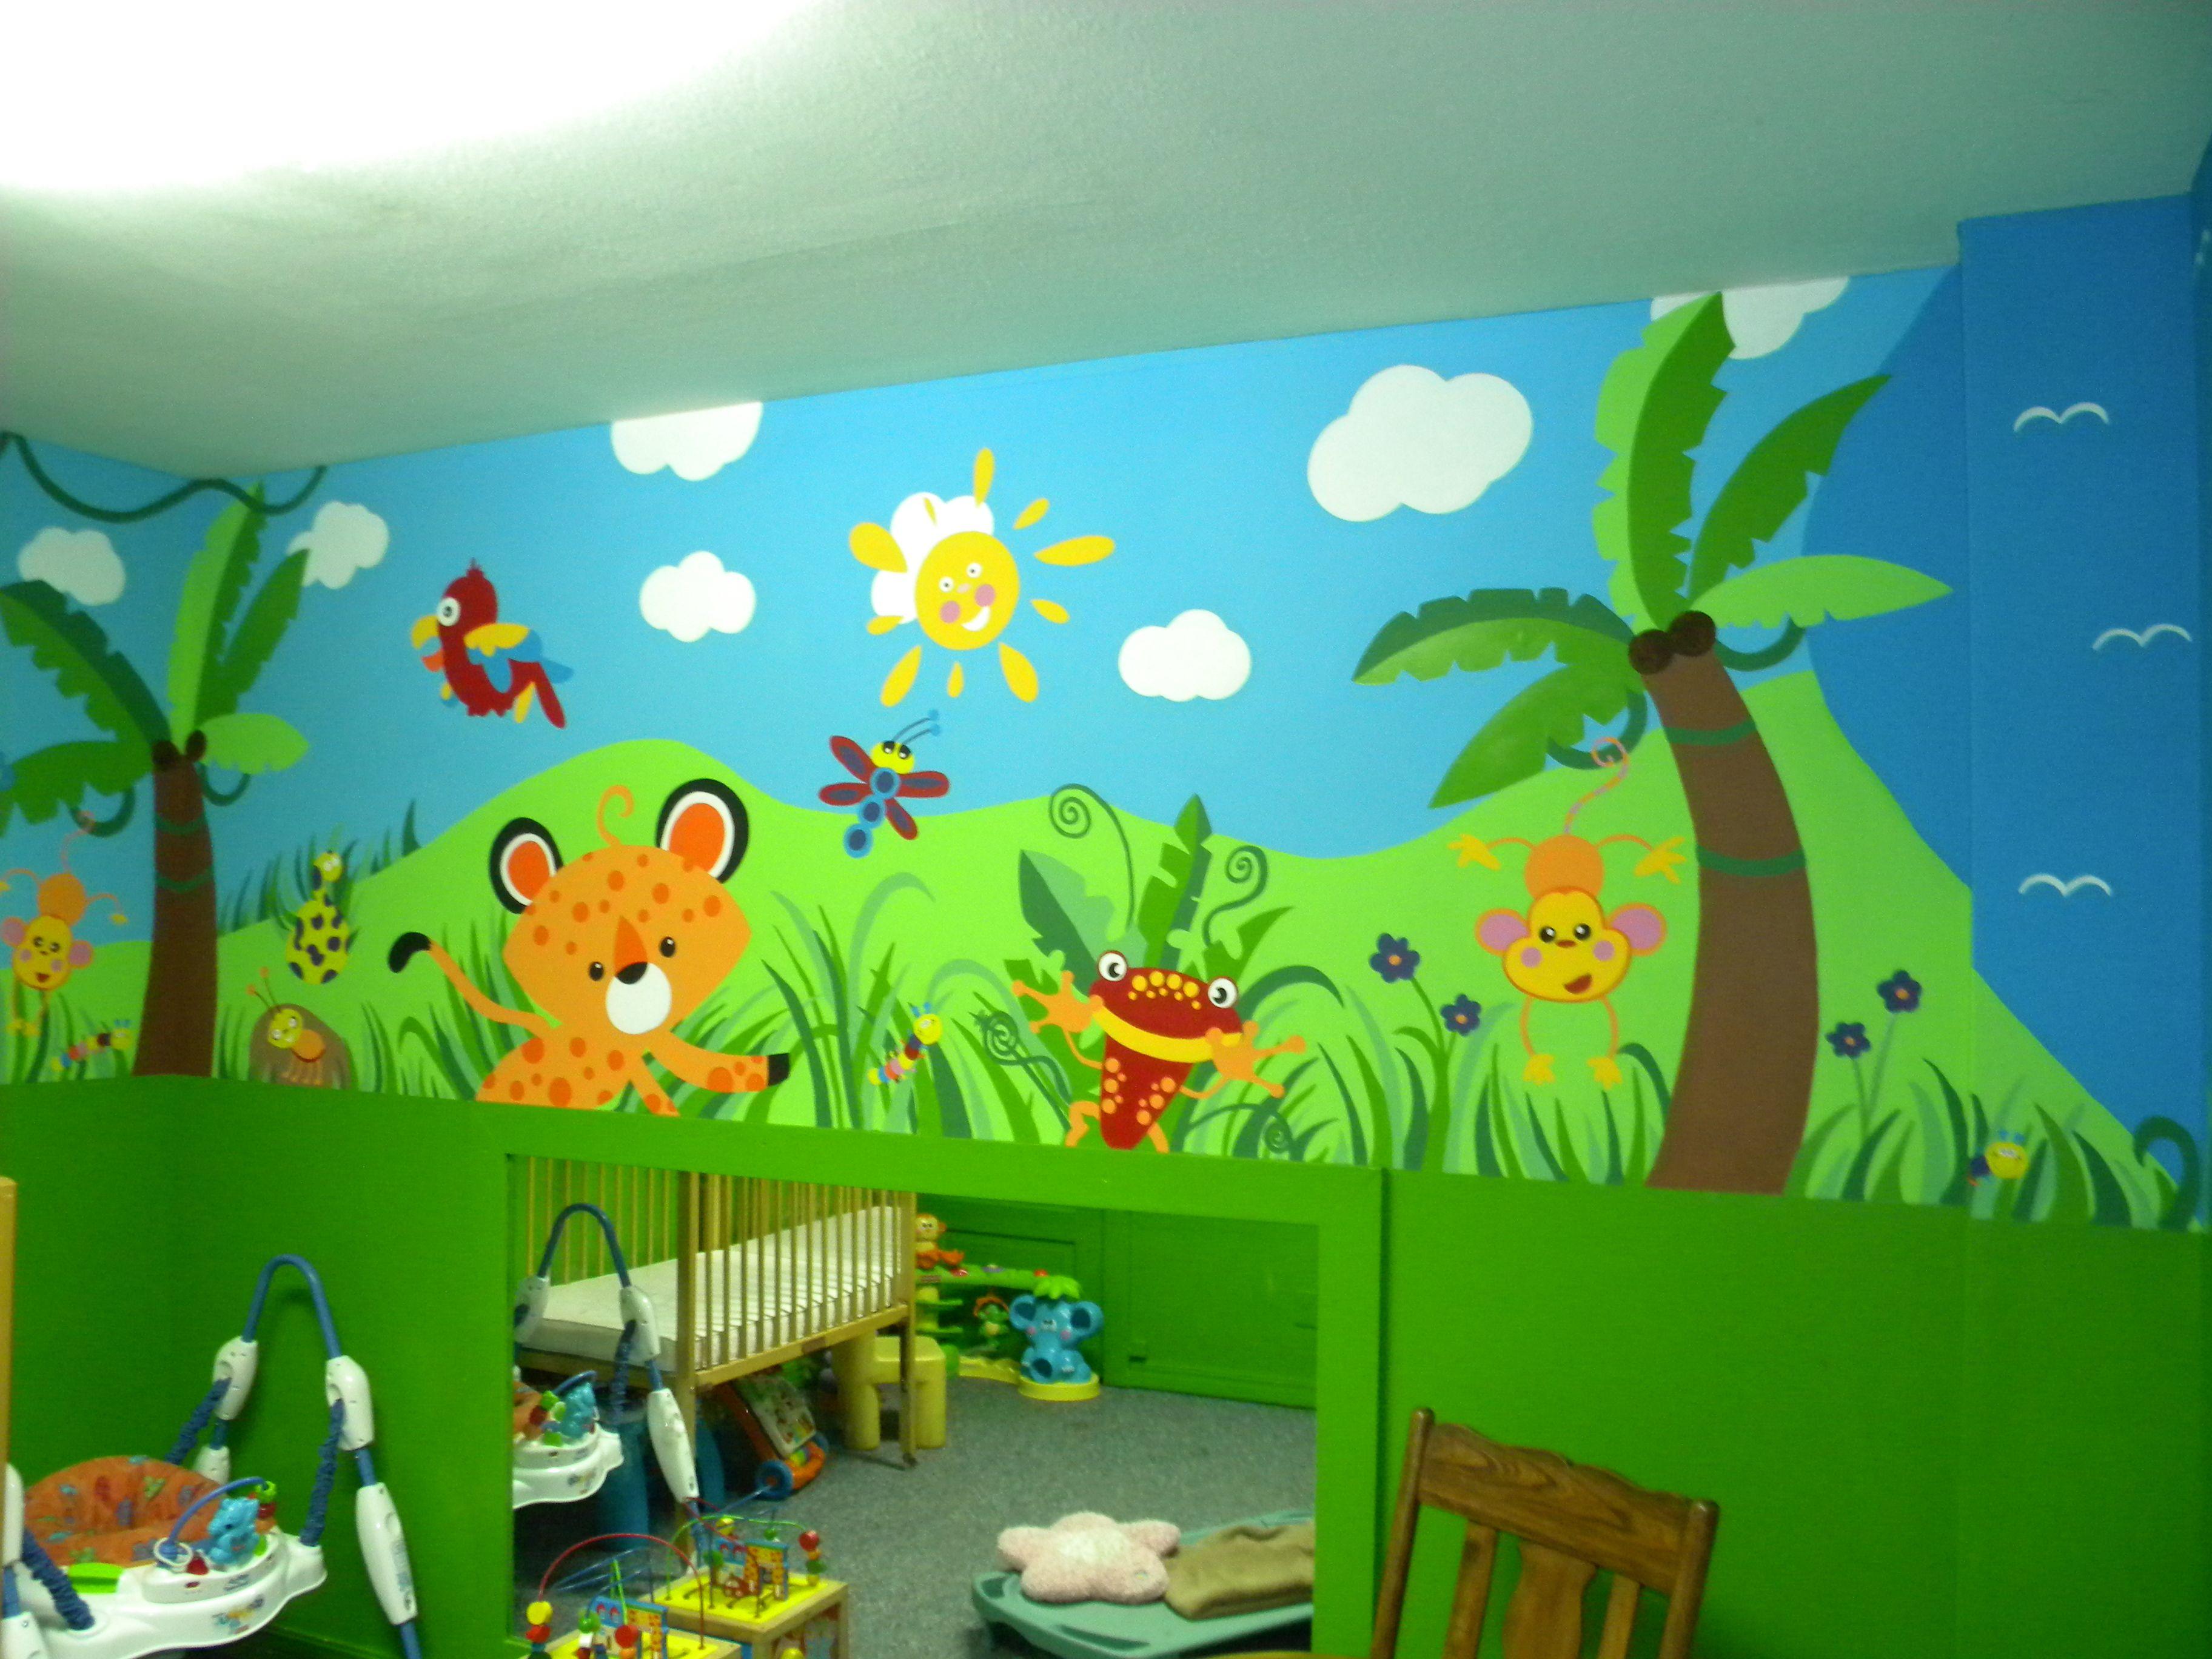 Daycare Jungle Mural